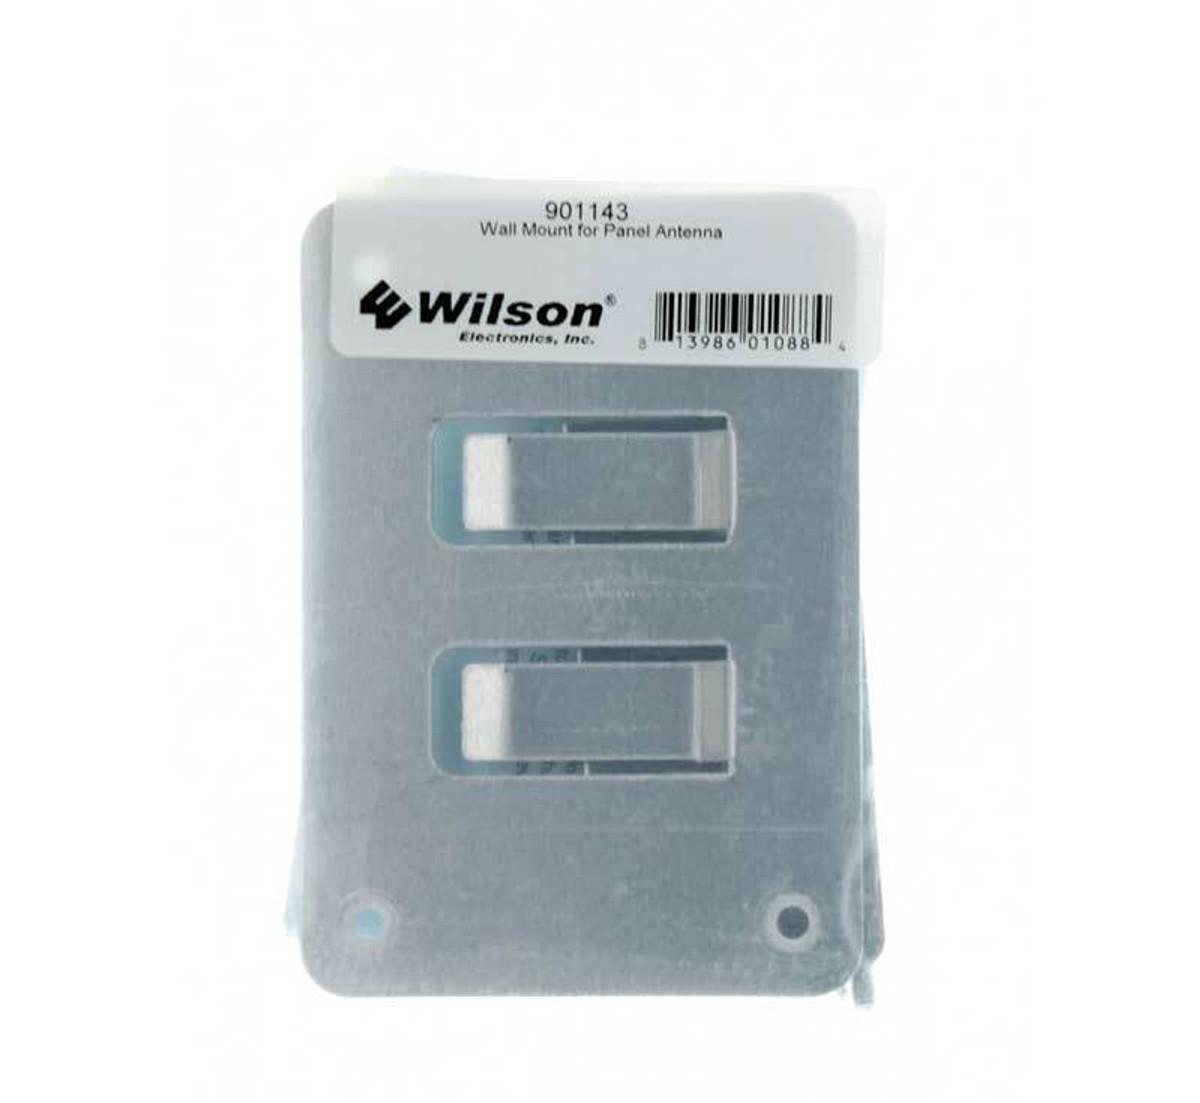 Wilson Electronics Wall Mount for Panel Antennas - 901143